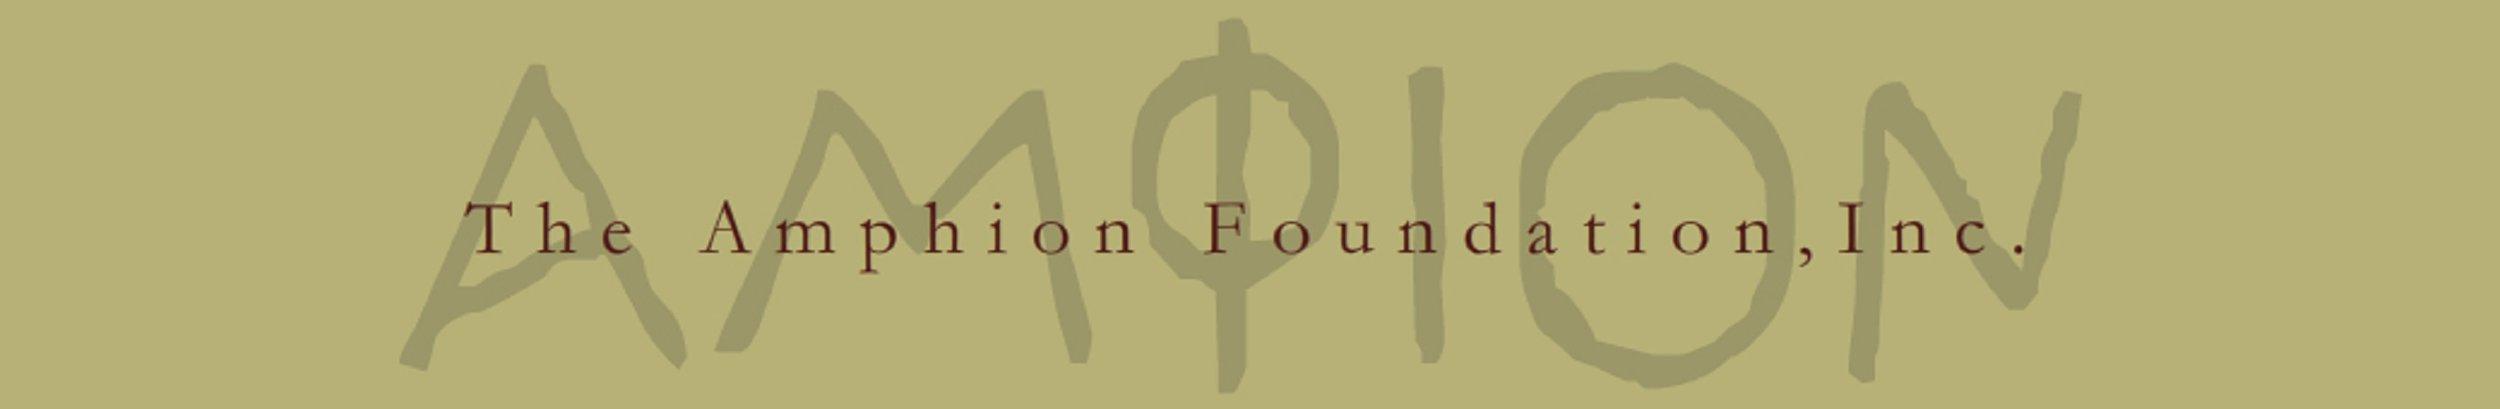 amphion_logo.jpg